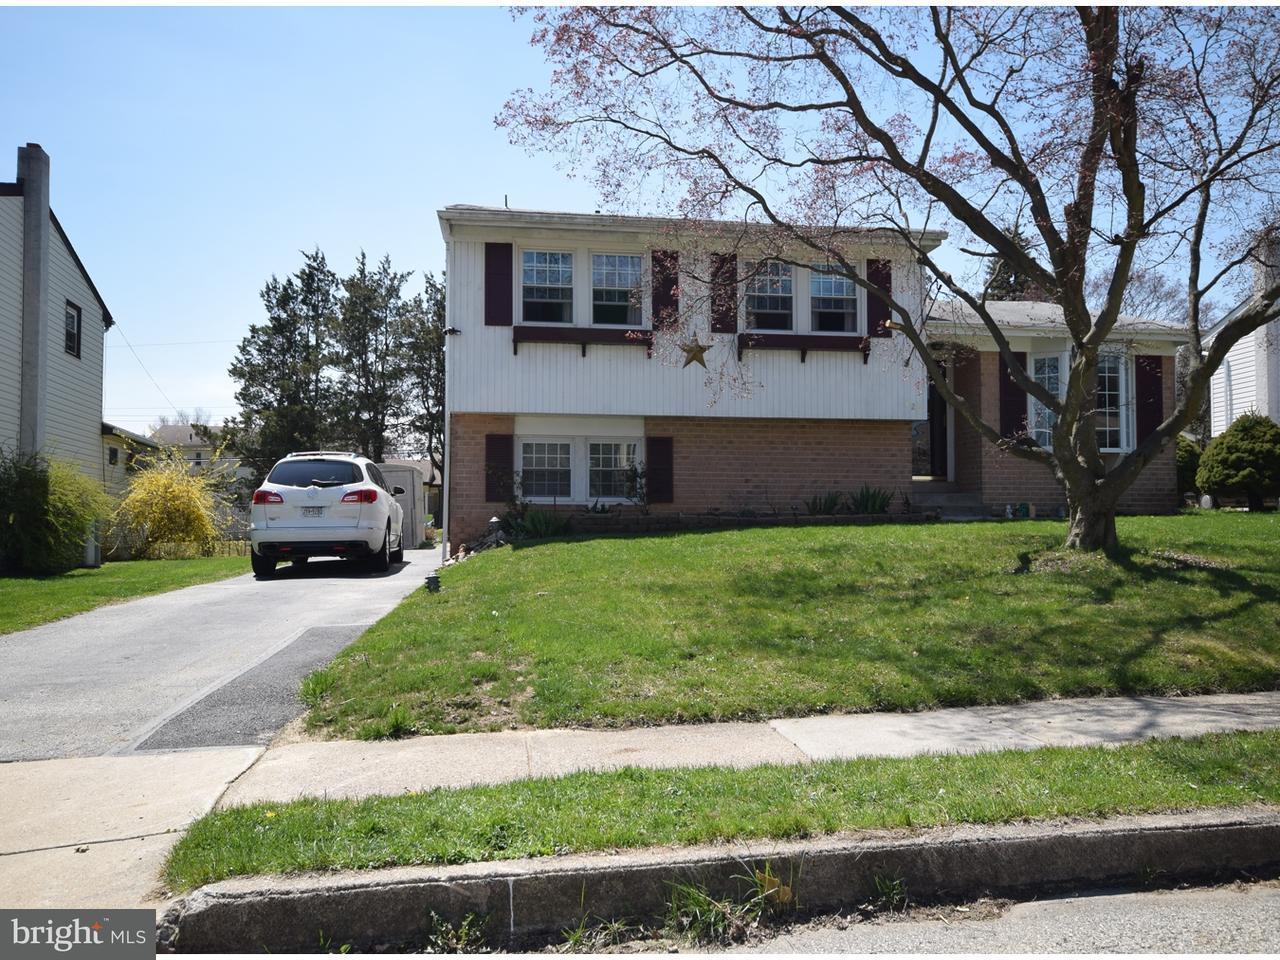 424  Farnsworth Drive Broomall, PA 19008